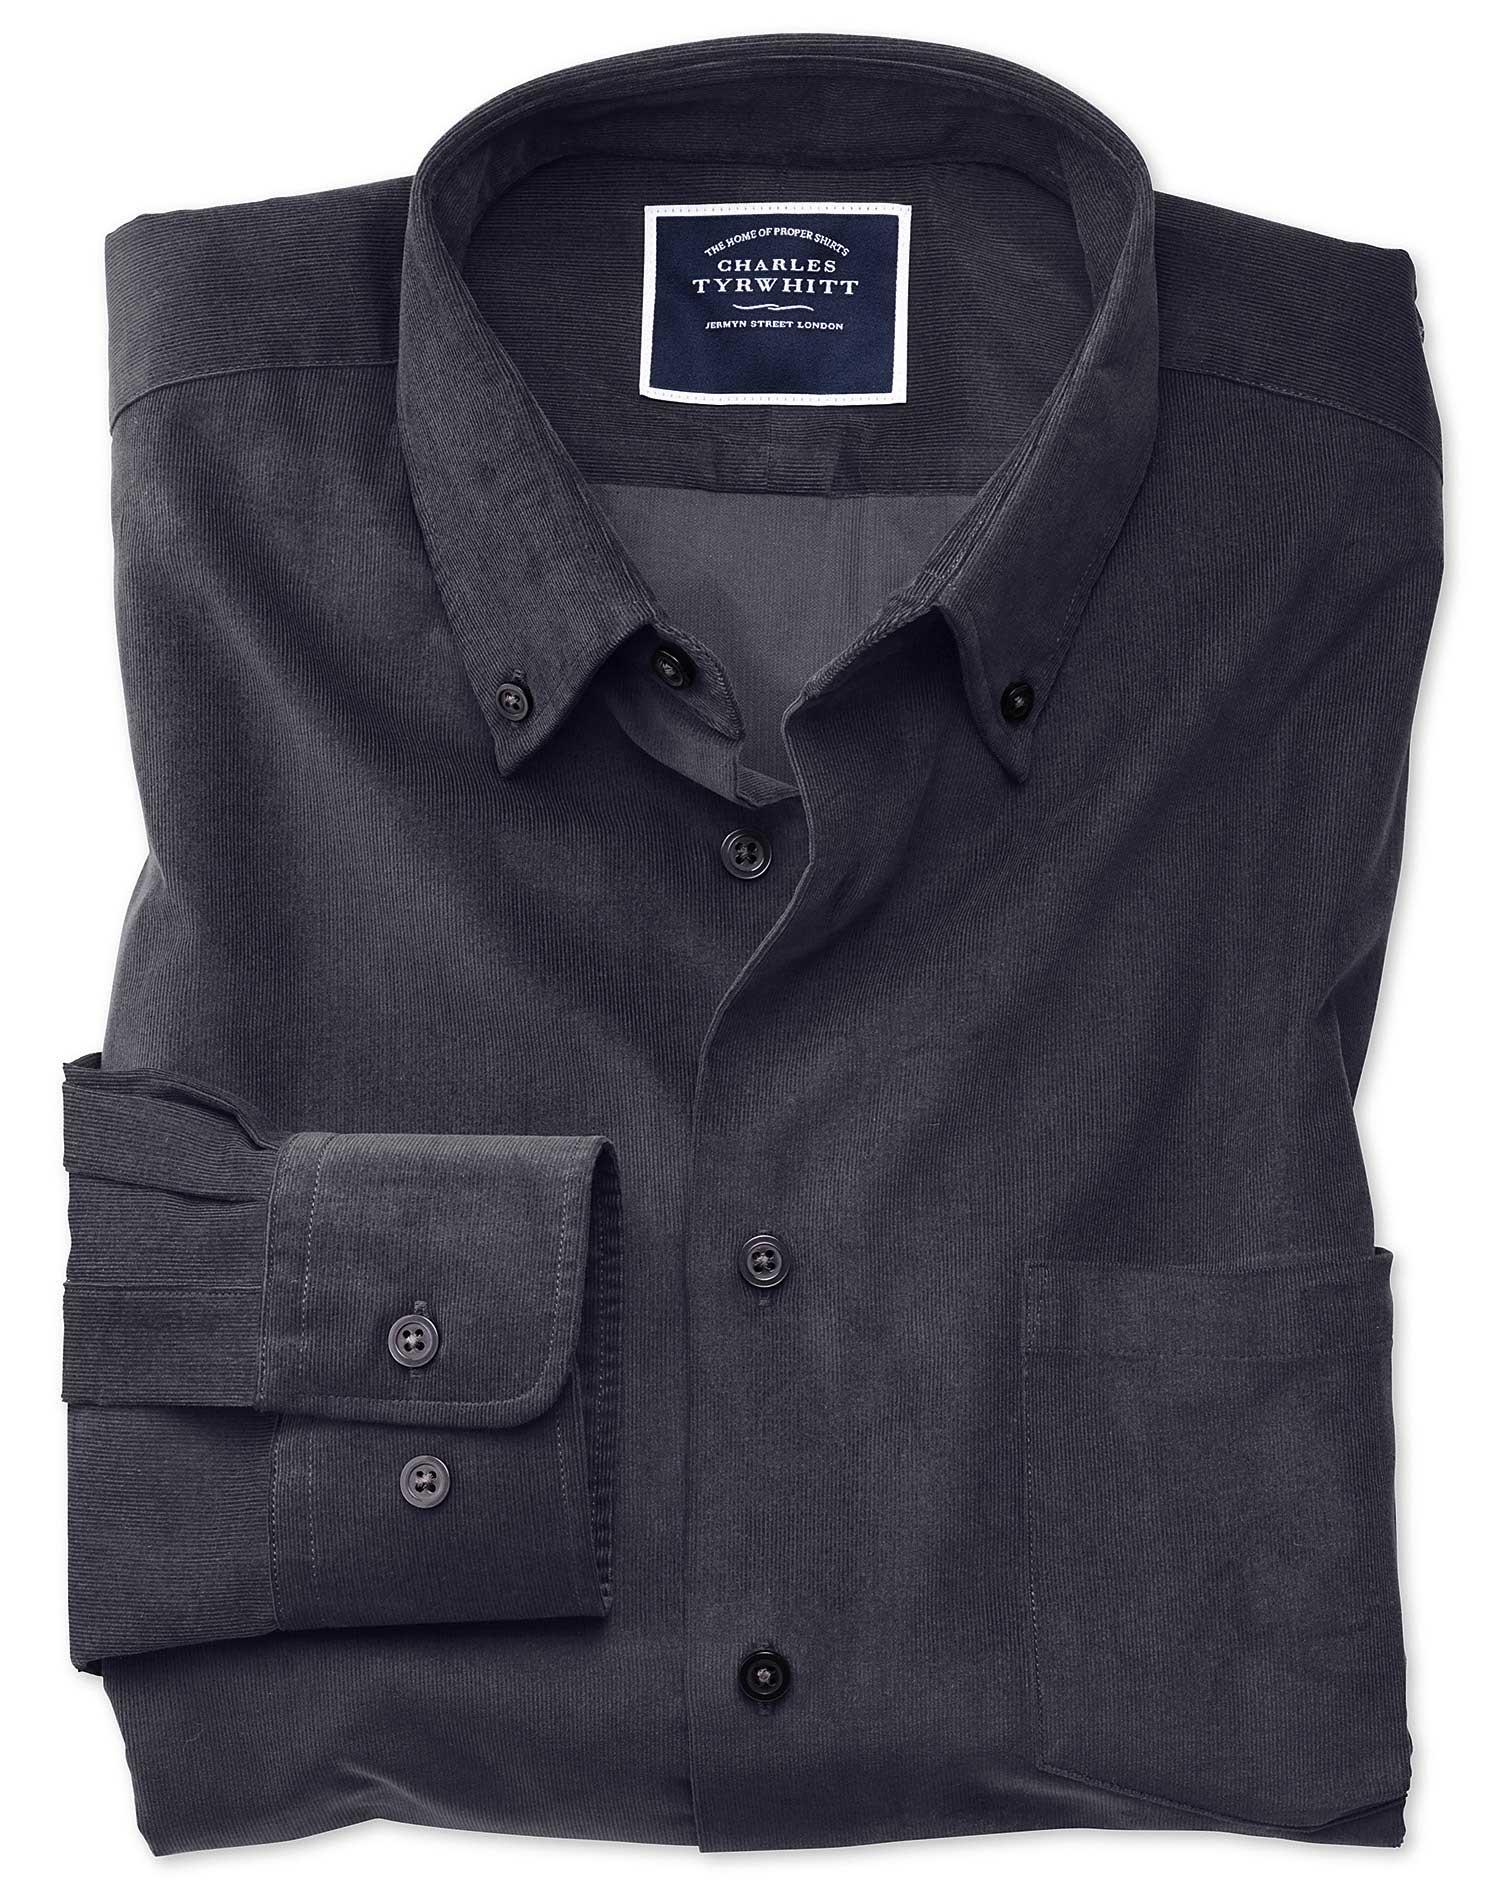 Classic Fit Plain Charcoal Fine Corduroy Cotton Shirt Single Cuff Size XL by Charles Tyrwhitt